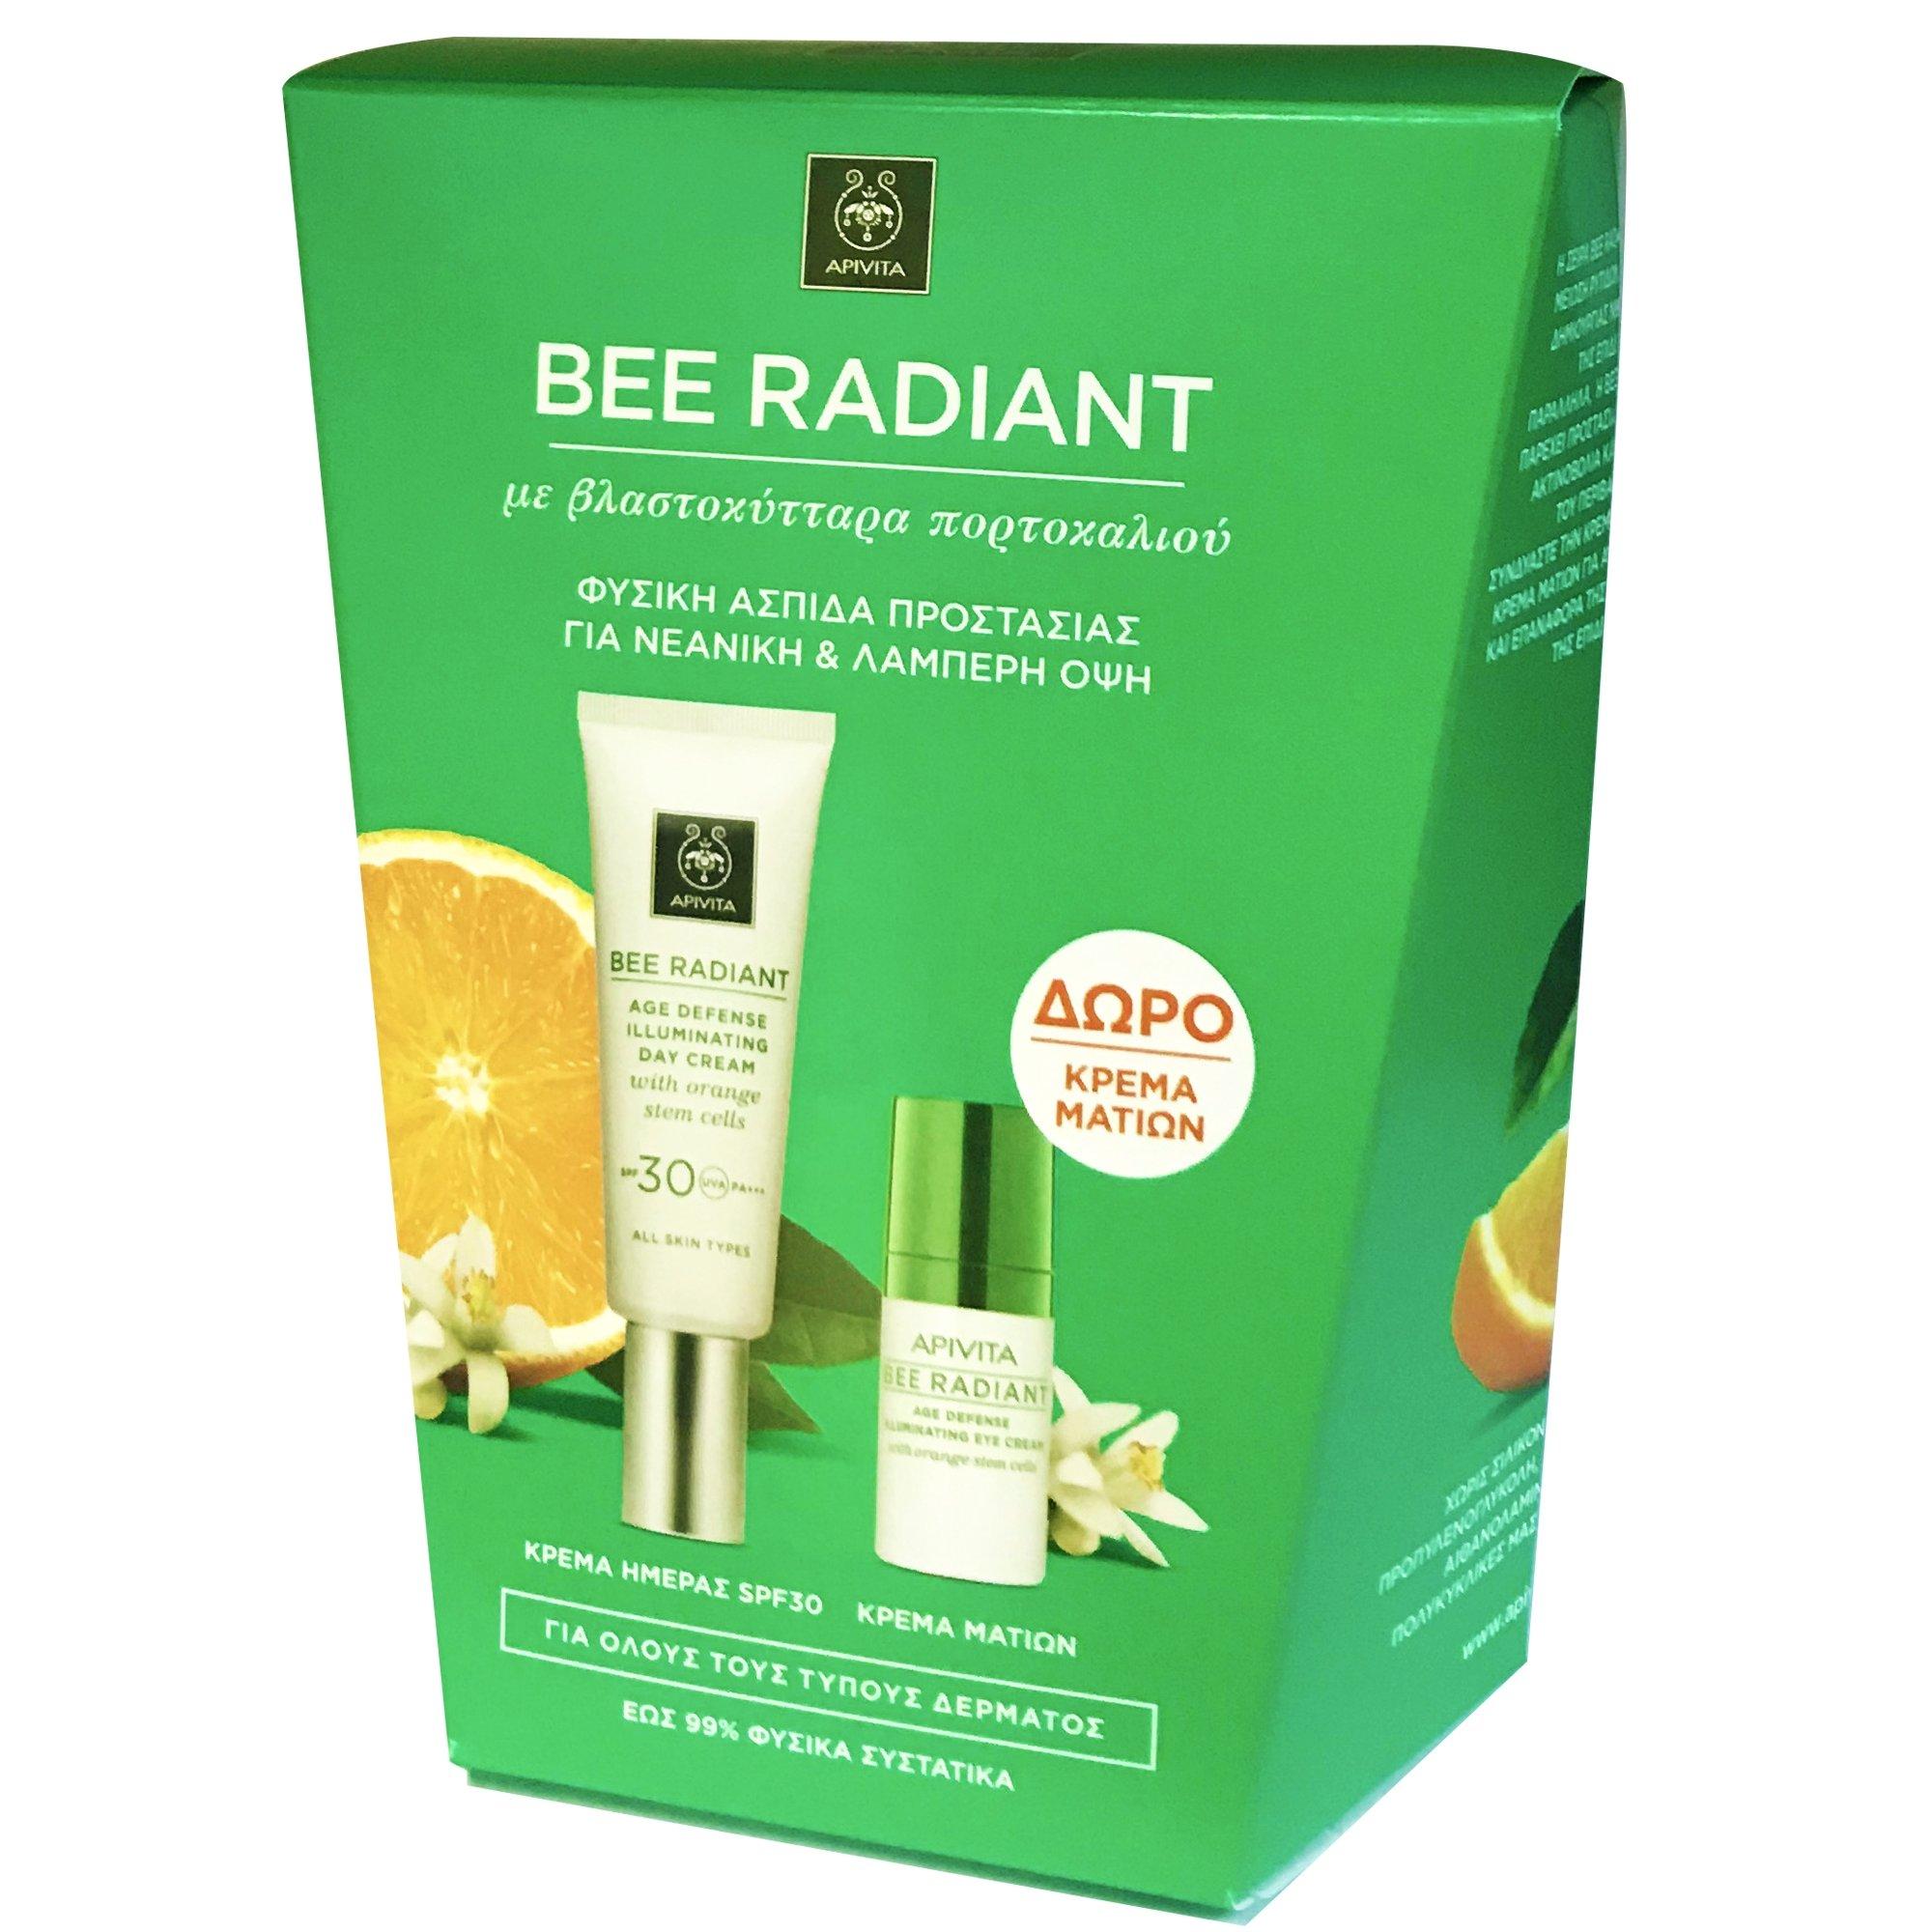 Apivita Πακέτο Προσφοράς Bee Radiant Age Defence Illuminating Day Cream Spf30, 40ml & Bee Radiant Eye Cream 15ml